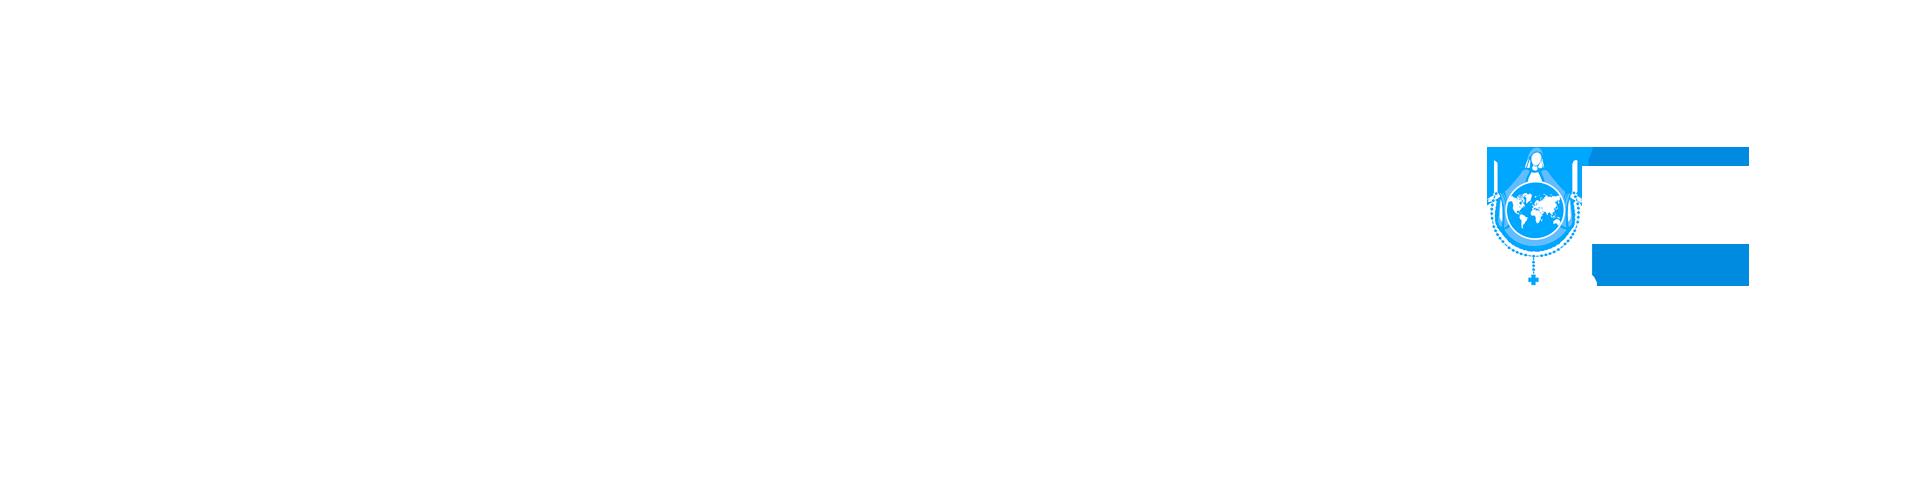 logos-pt-novena.png